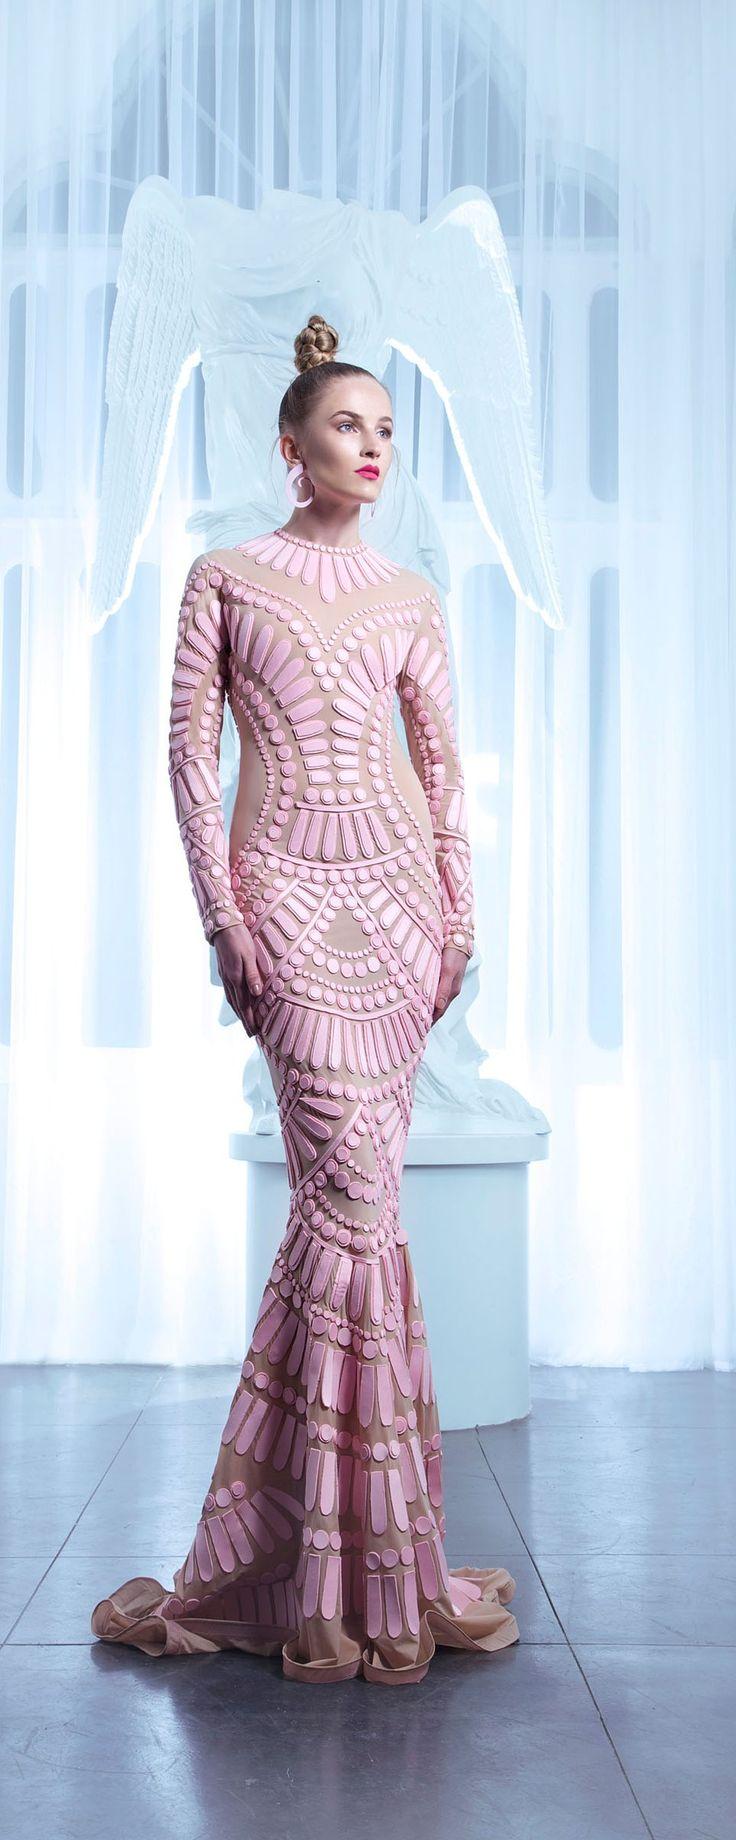 Nicolas Jebran İlkbahar-Yaz 2015 - Haute couture - http://tr.orientpalms.com/Nicolas-Jebran-5749